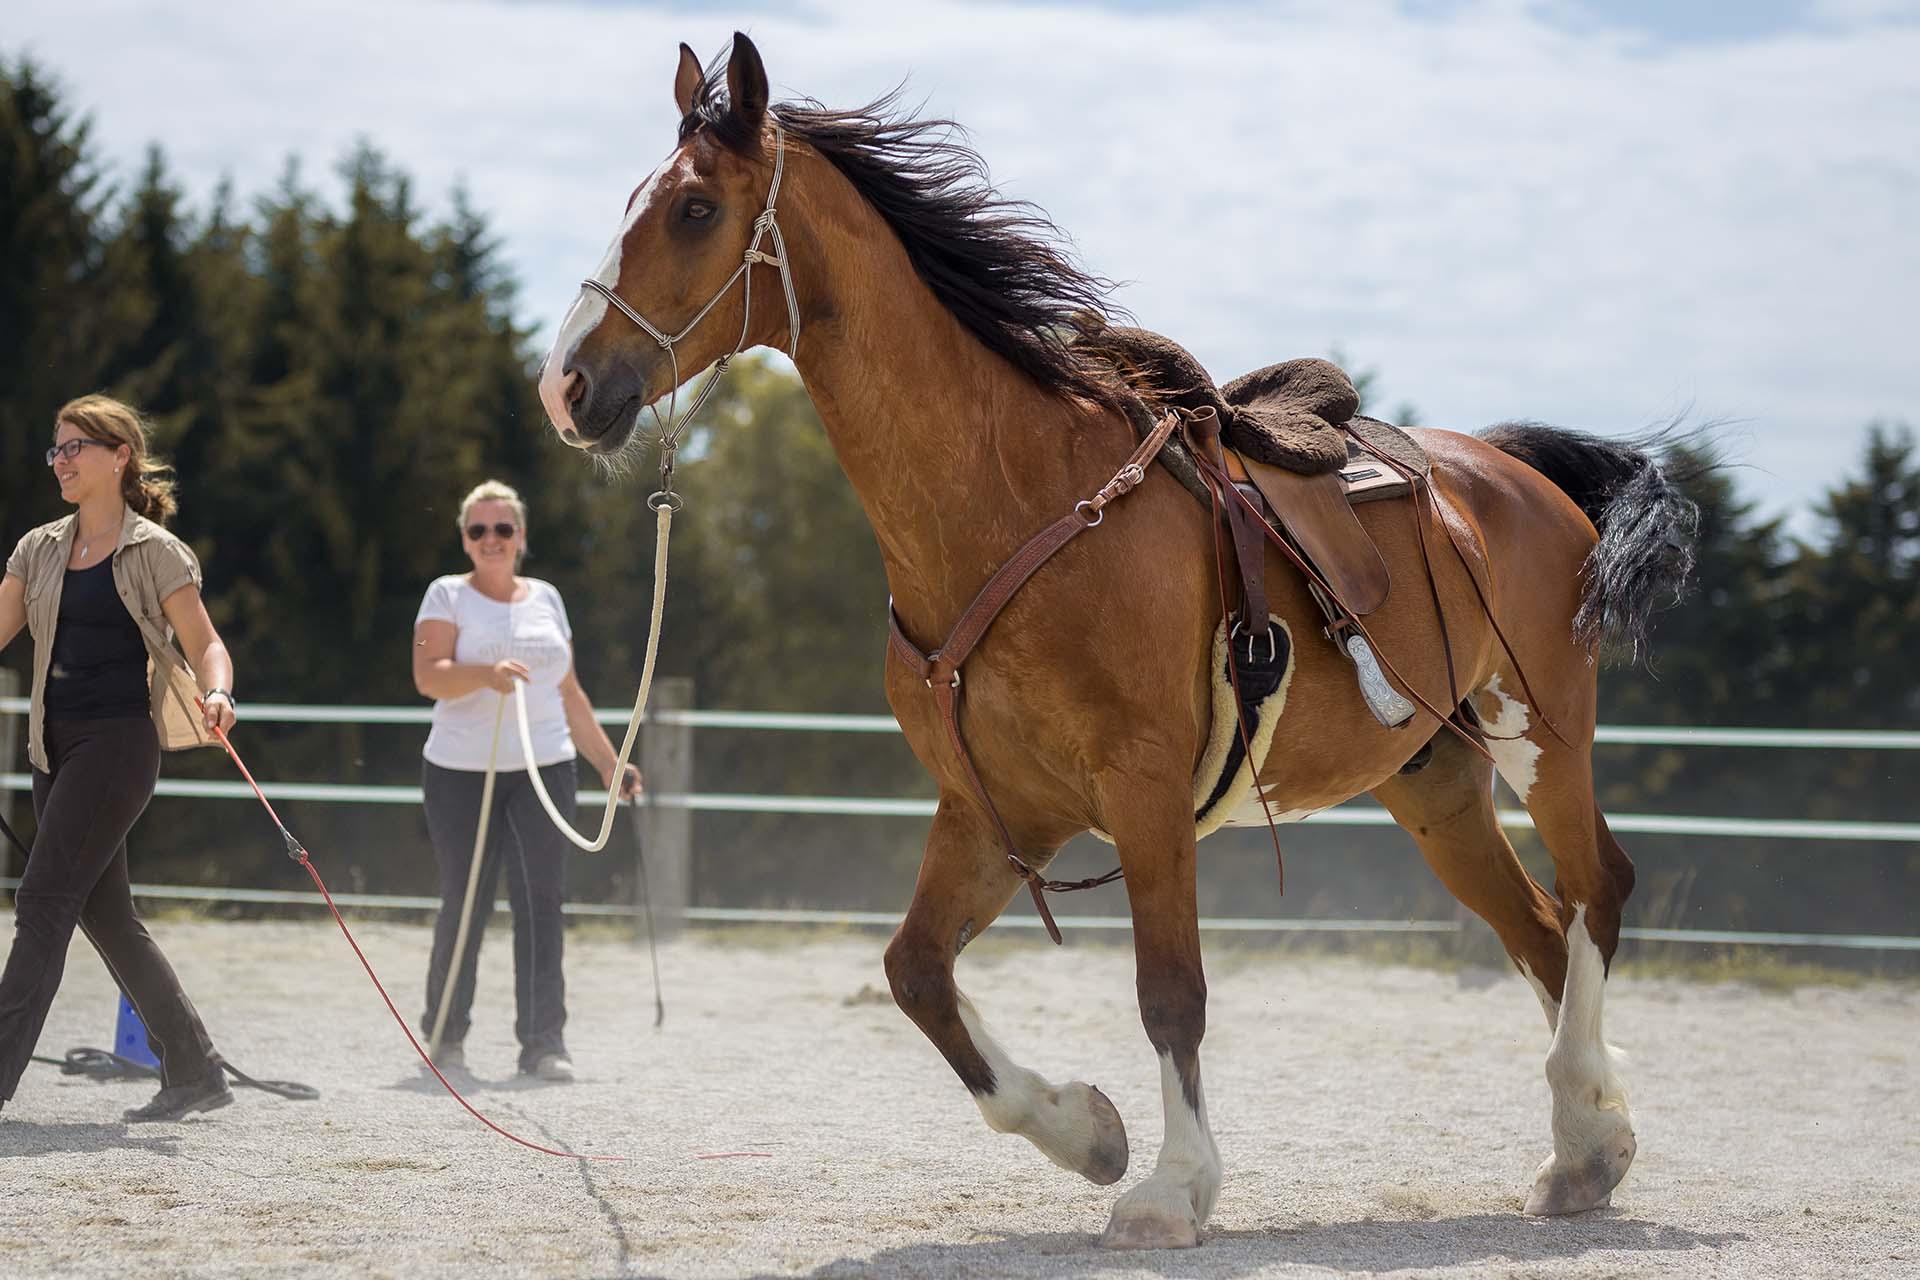 Hund&Pferd_Equine